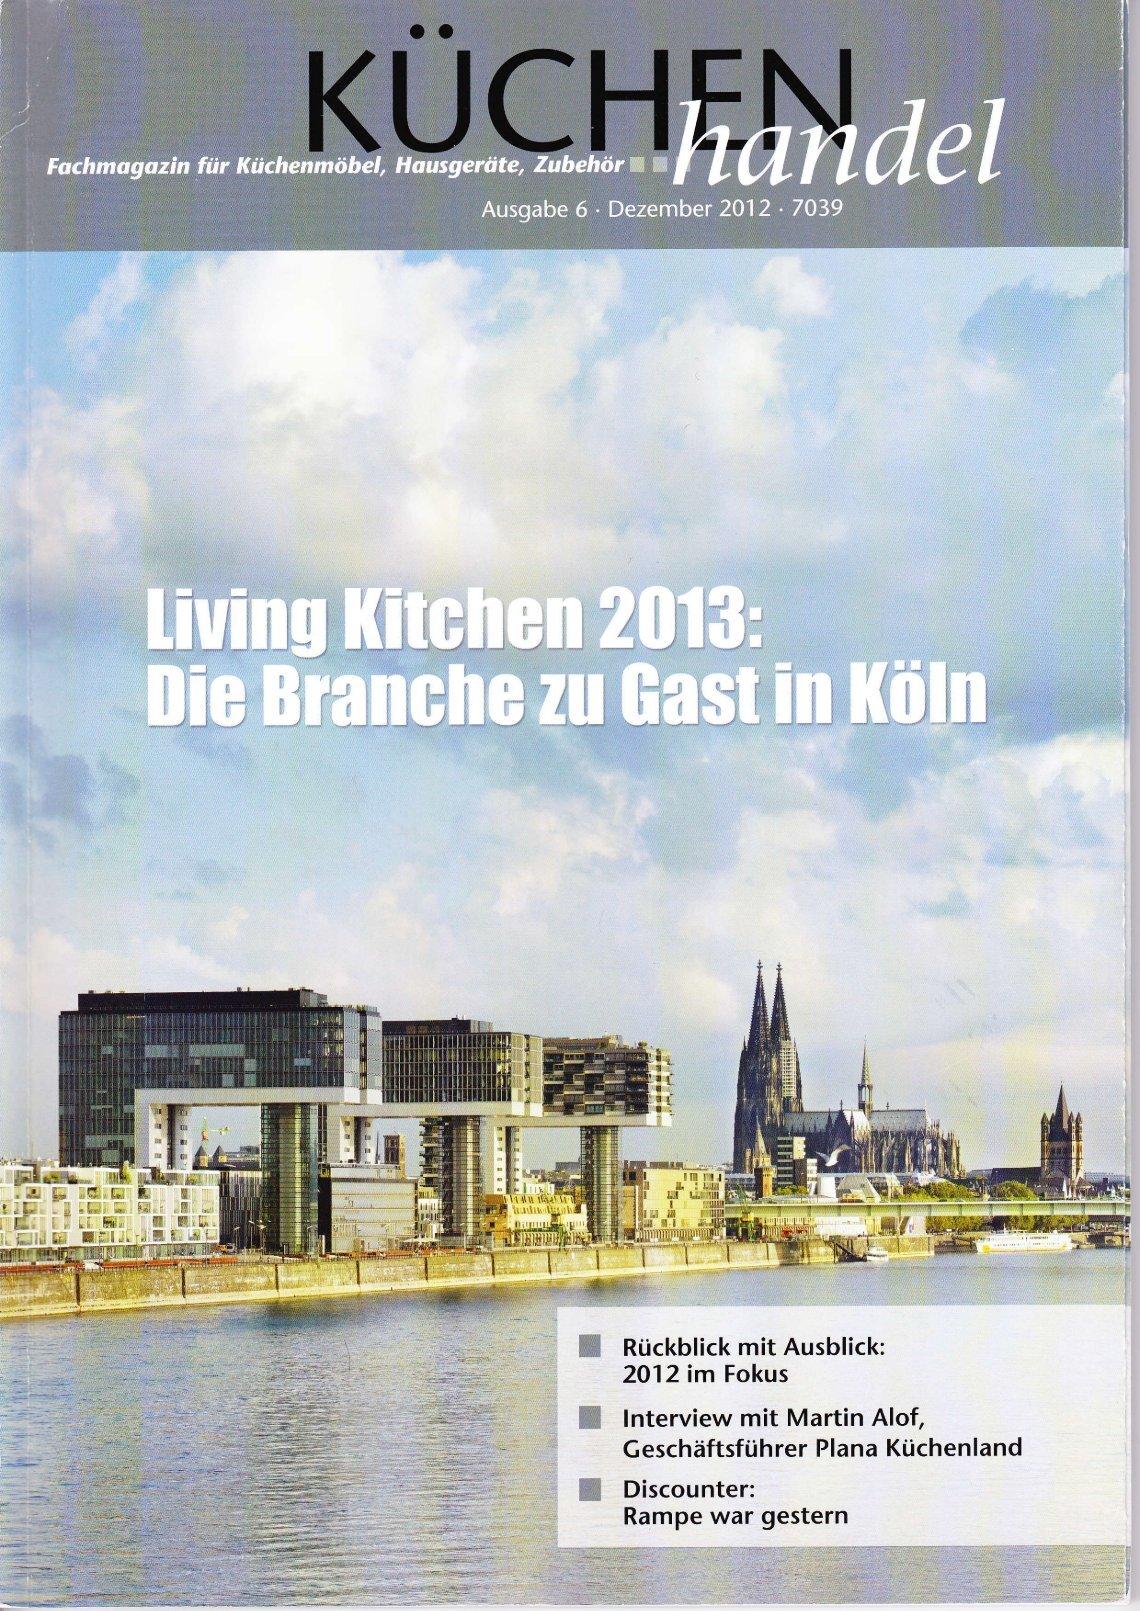 Plana Küchenland Köln 40 free magazines from wulf rabe design com